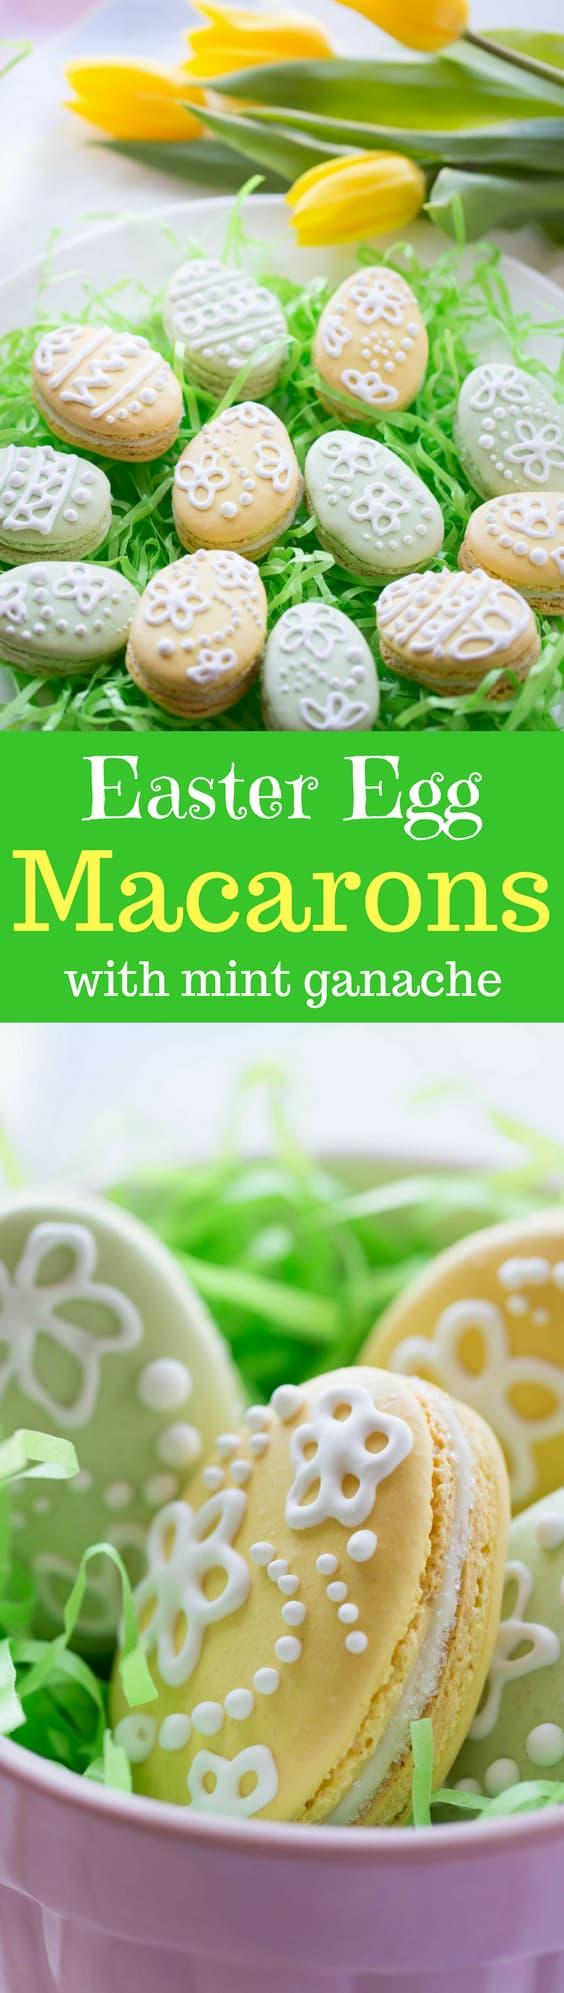 Macarons with White Chocolate-Mint Ganache - Saving Room for Dessert